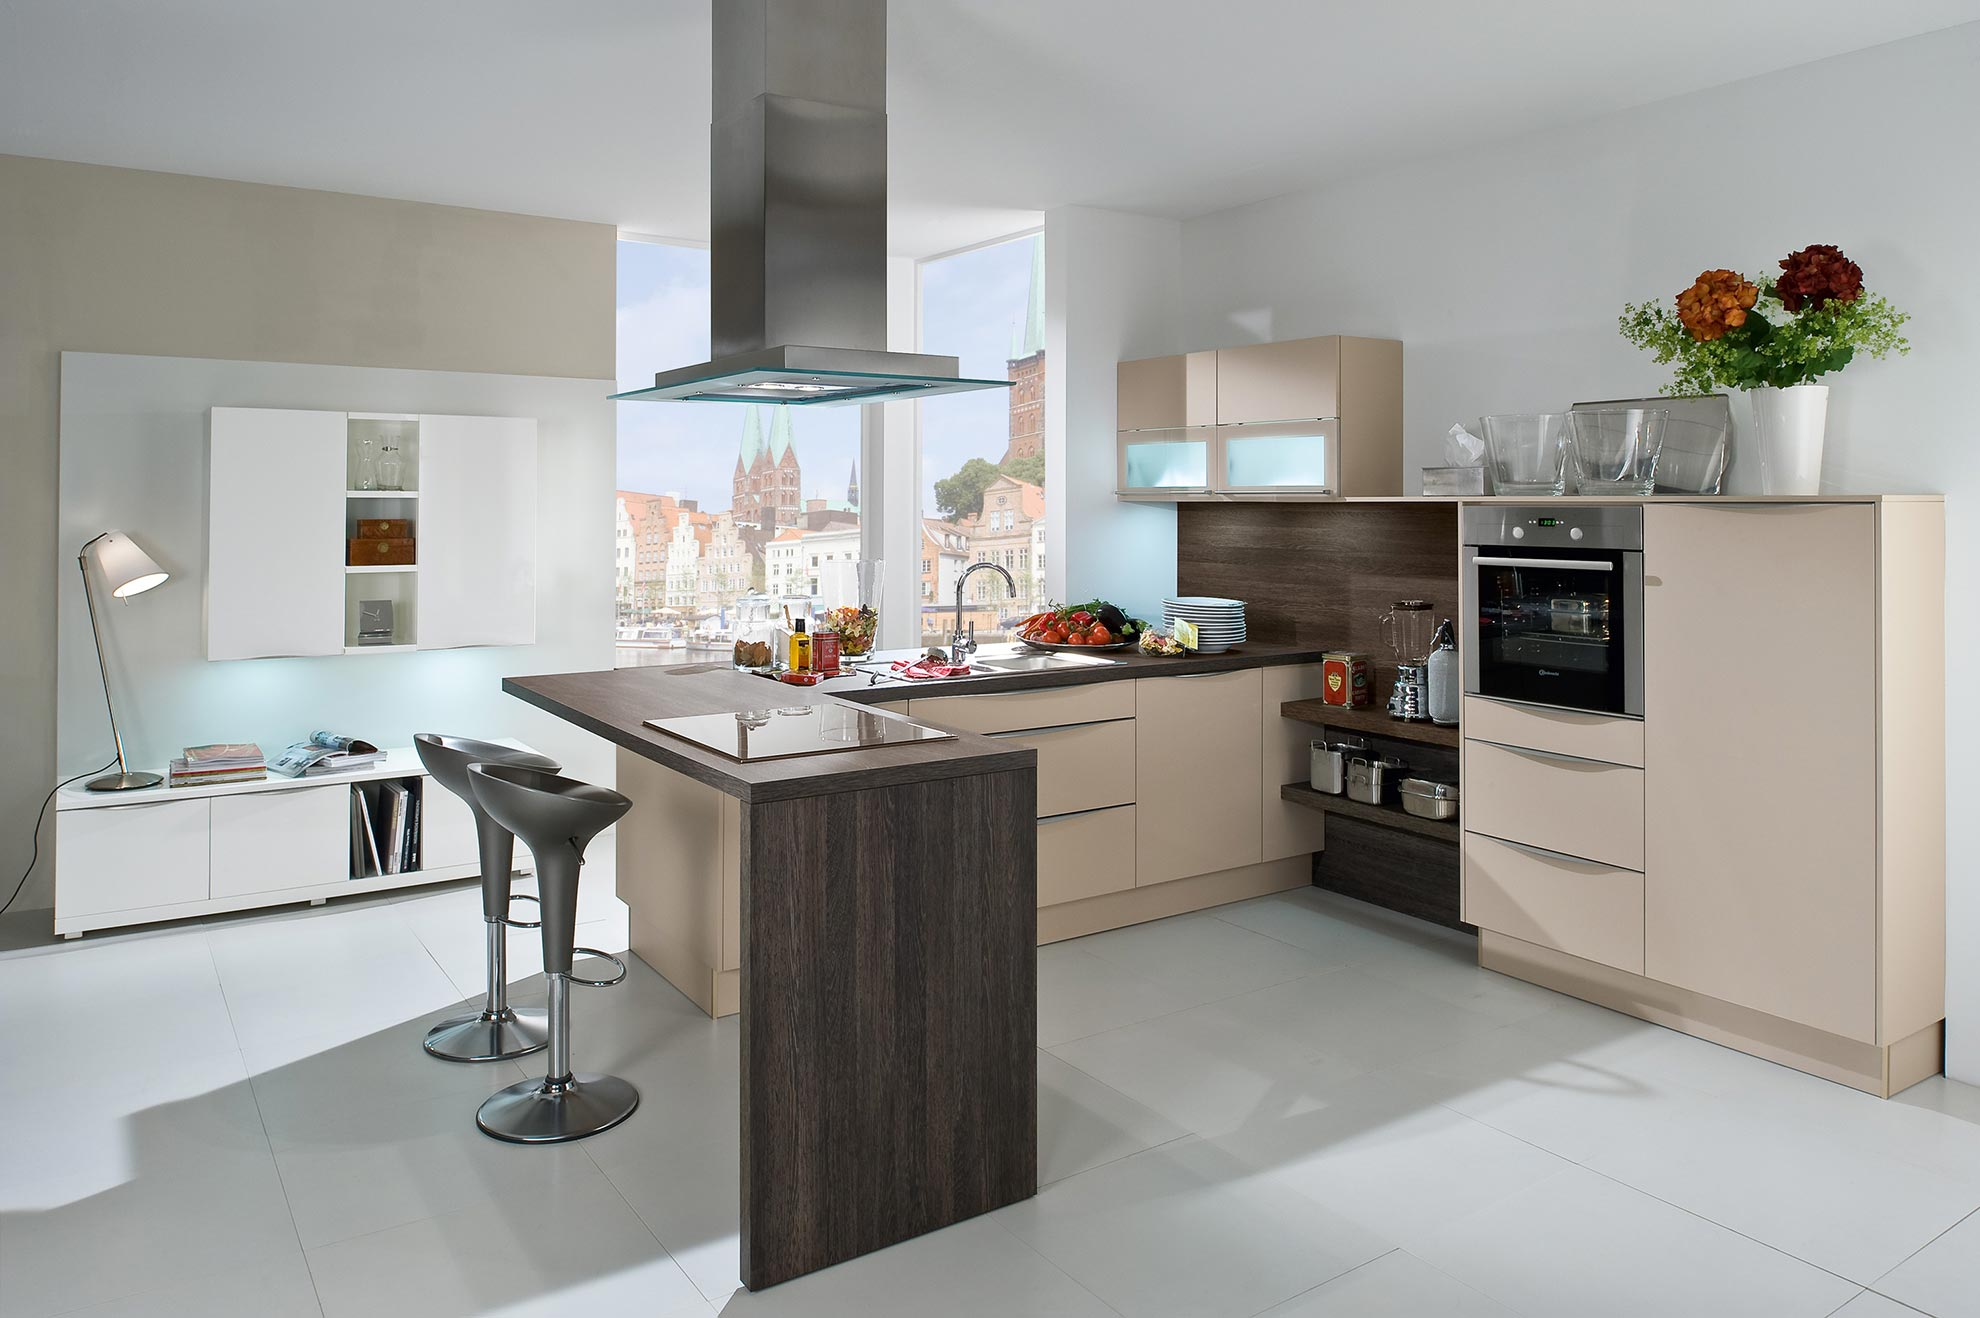 Kitchens Bedford Amp Bedfordshire Fitted Kitchen Installation